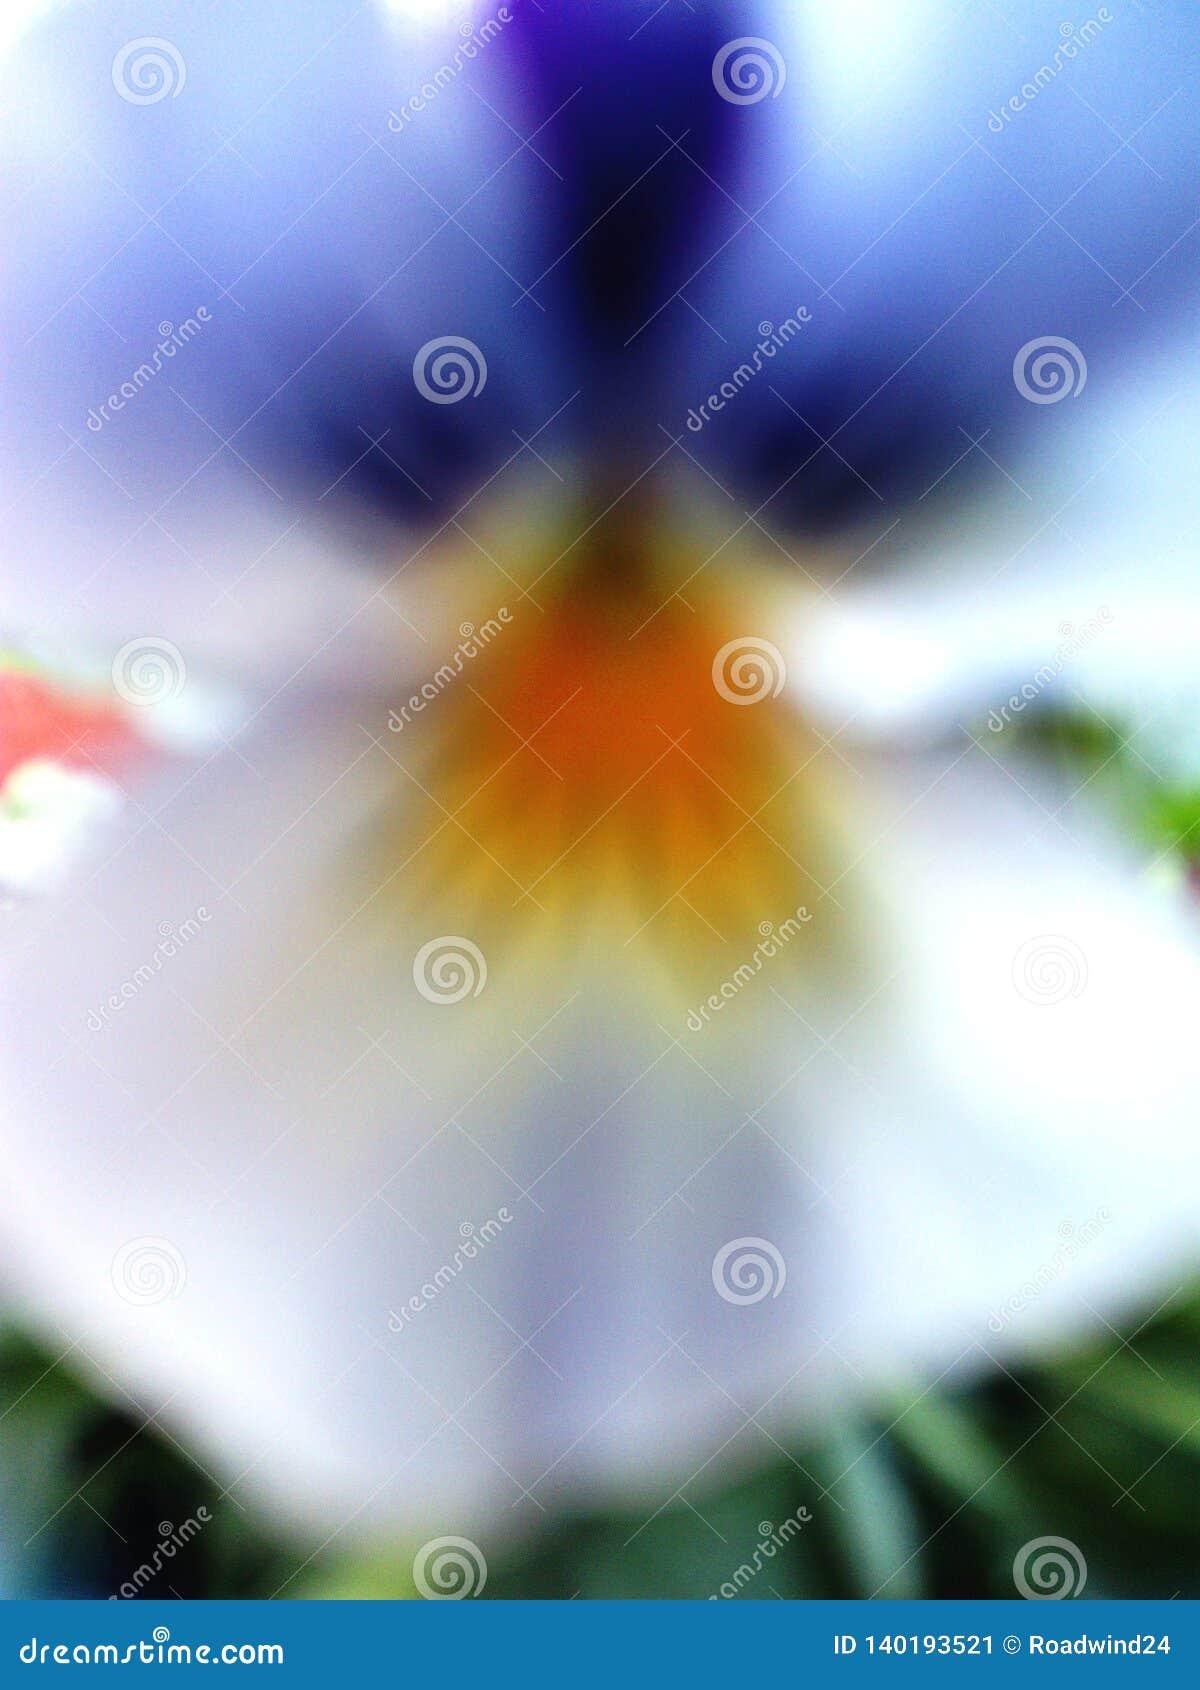 Abstract birdlike flower viola tricolor